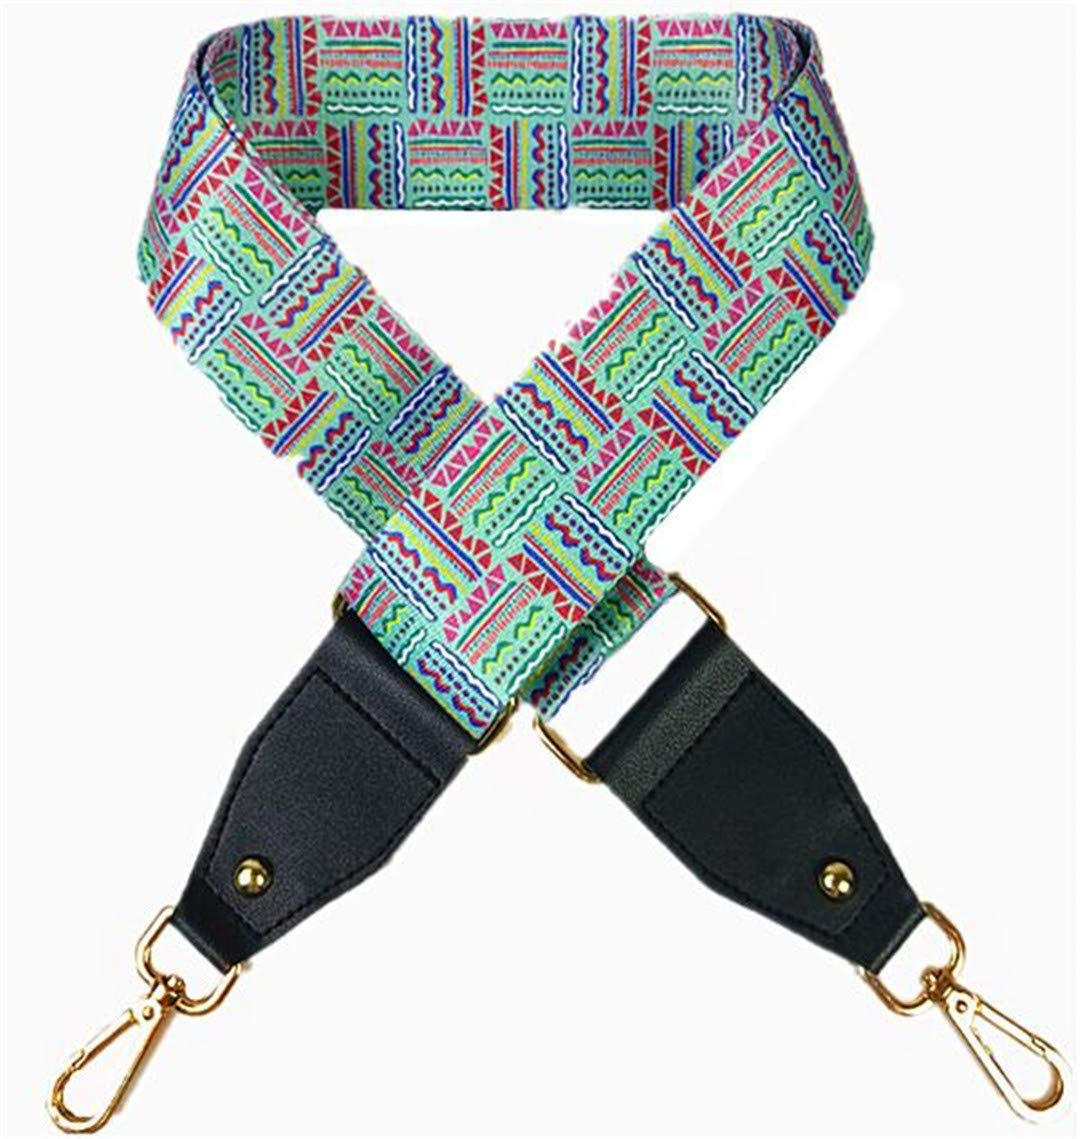 Fashion Canvas Women Bag Strap National Style Adjust Handle For Lady Shoulder Strap Trendy Bag Belts Q0121 Sui BoLi